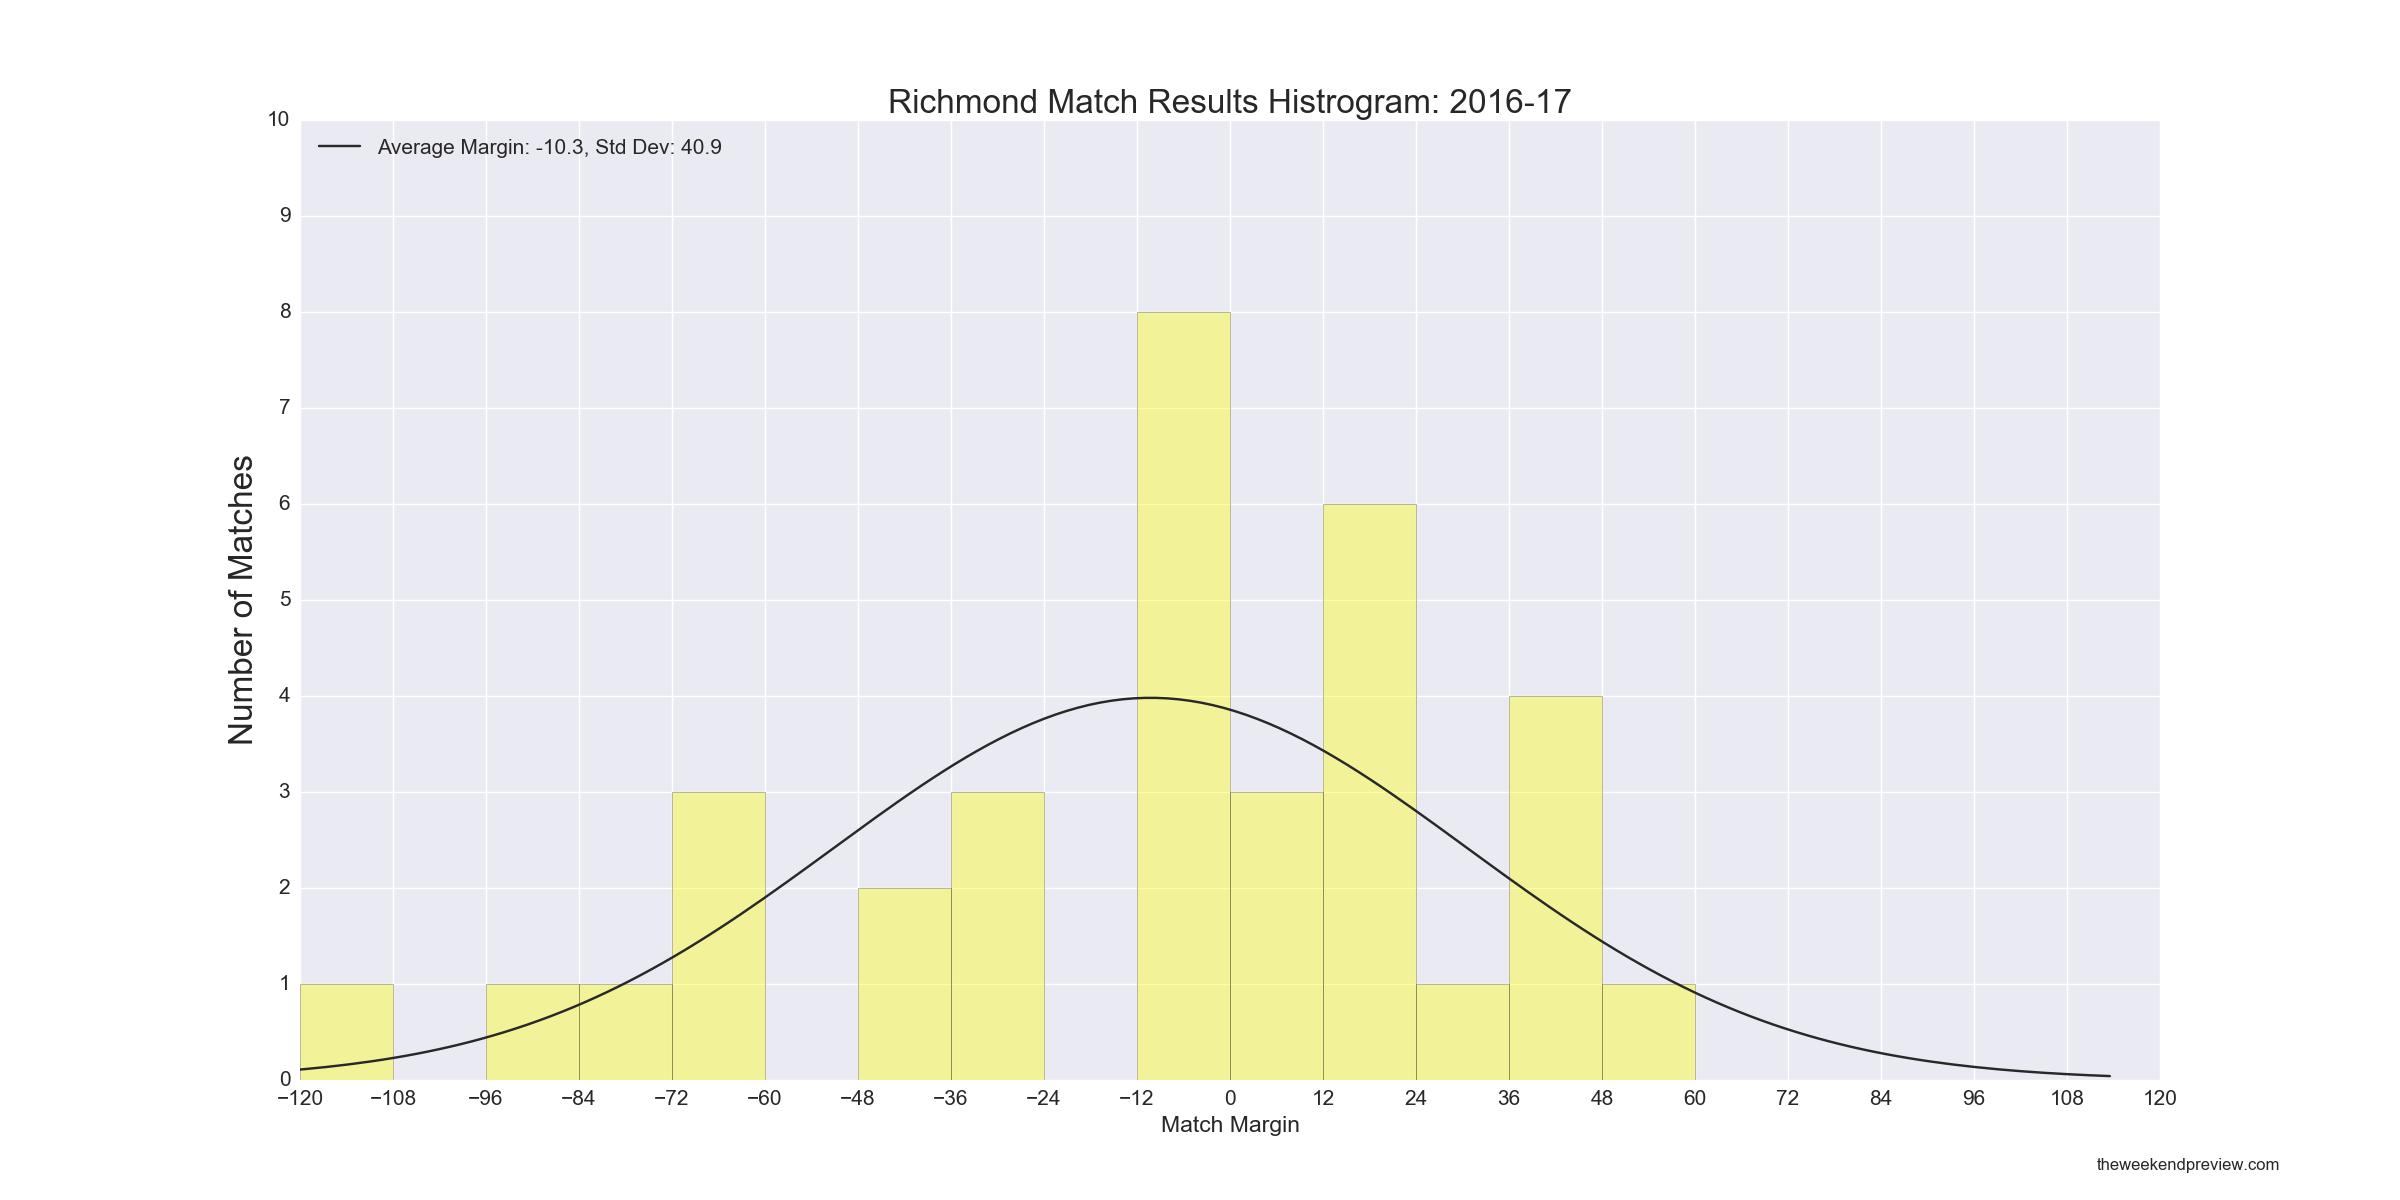 Figure-4: Richmond Match Results Histogram – 2016-17